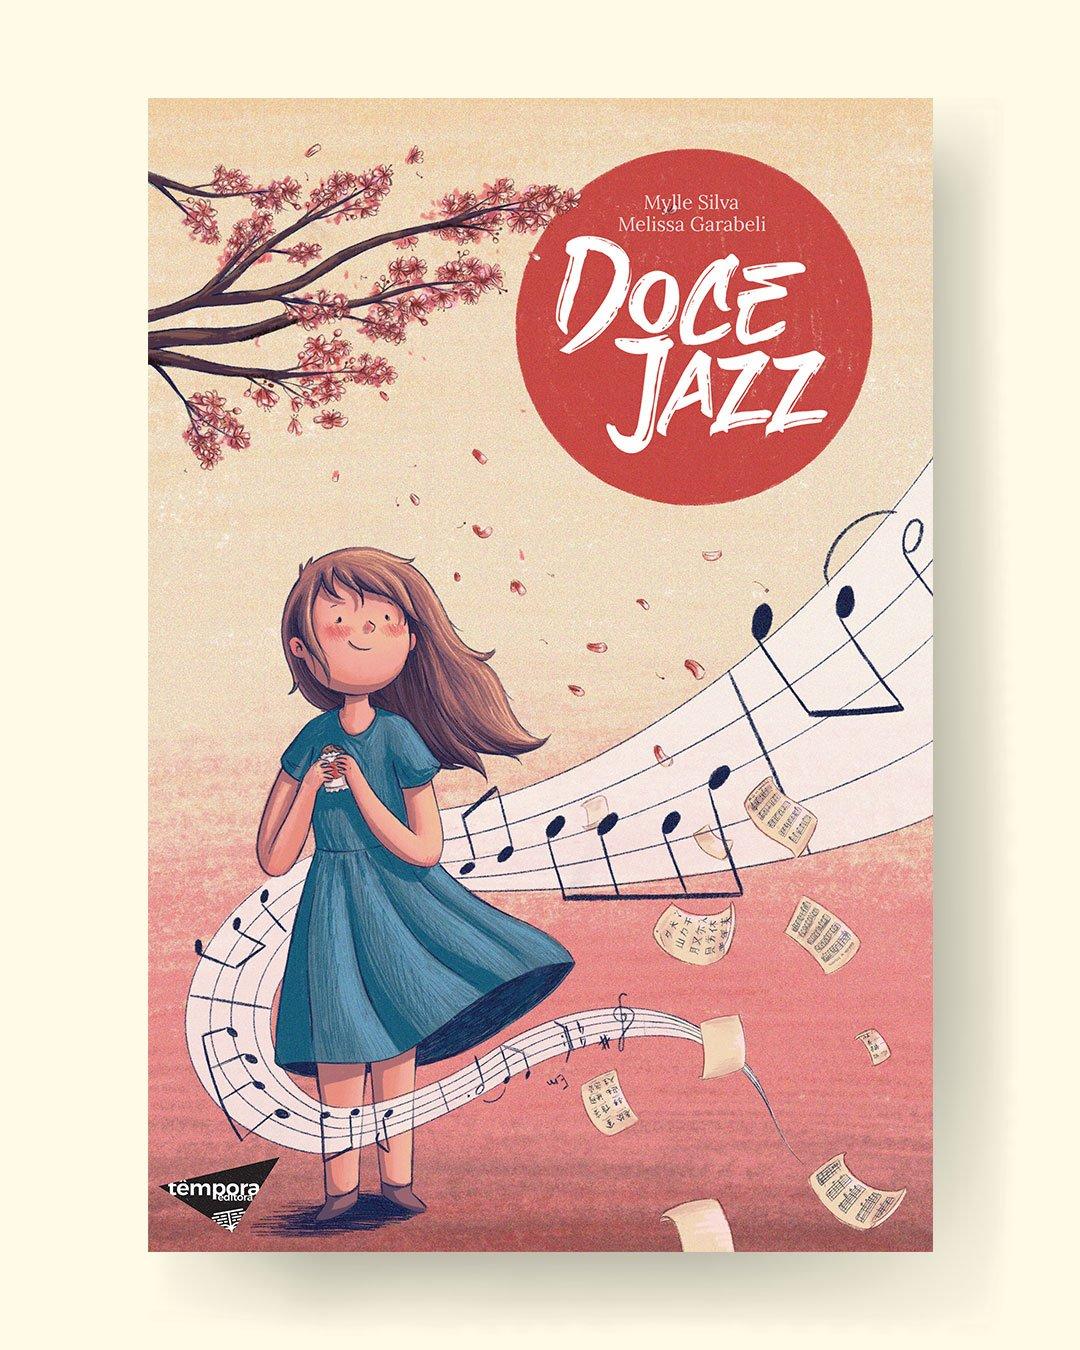 Doce Jazz - Mylle Silva e Melissa Garabeli - CCXP 2019